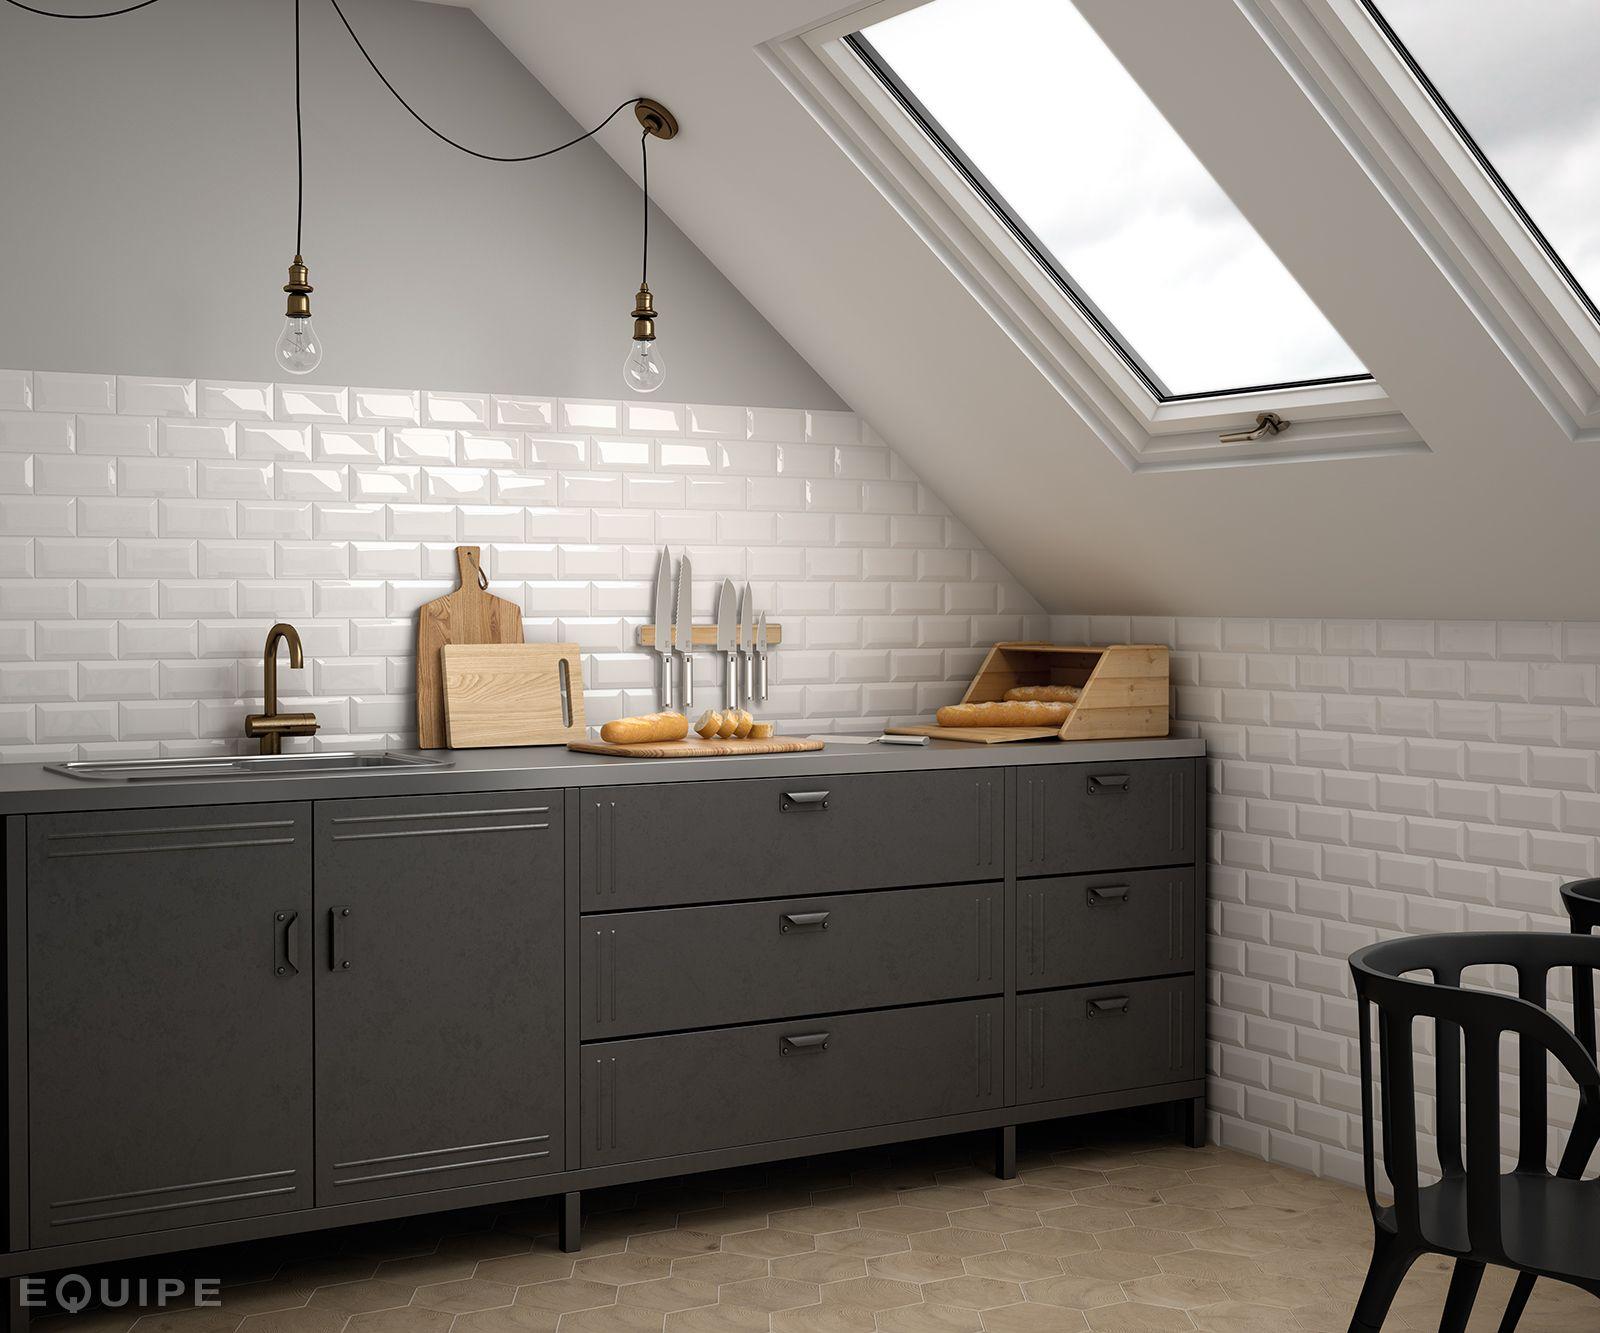 Metro white hexawood natural kitchen walls